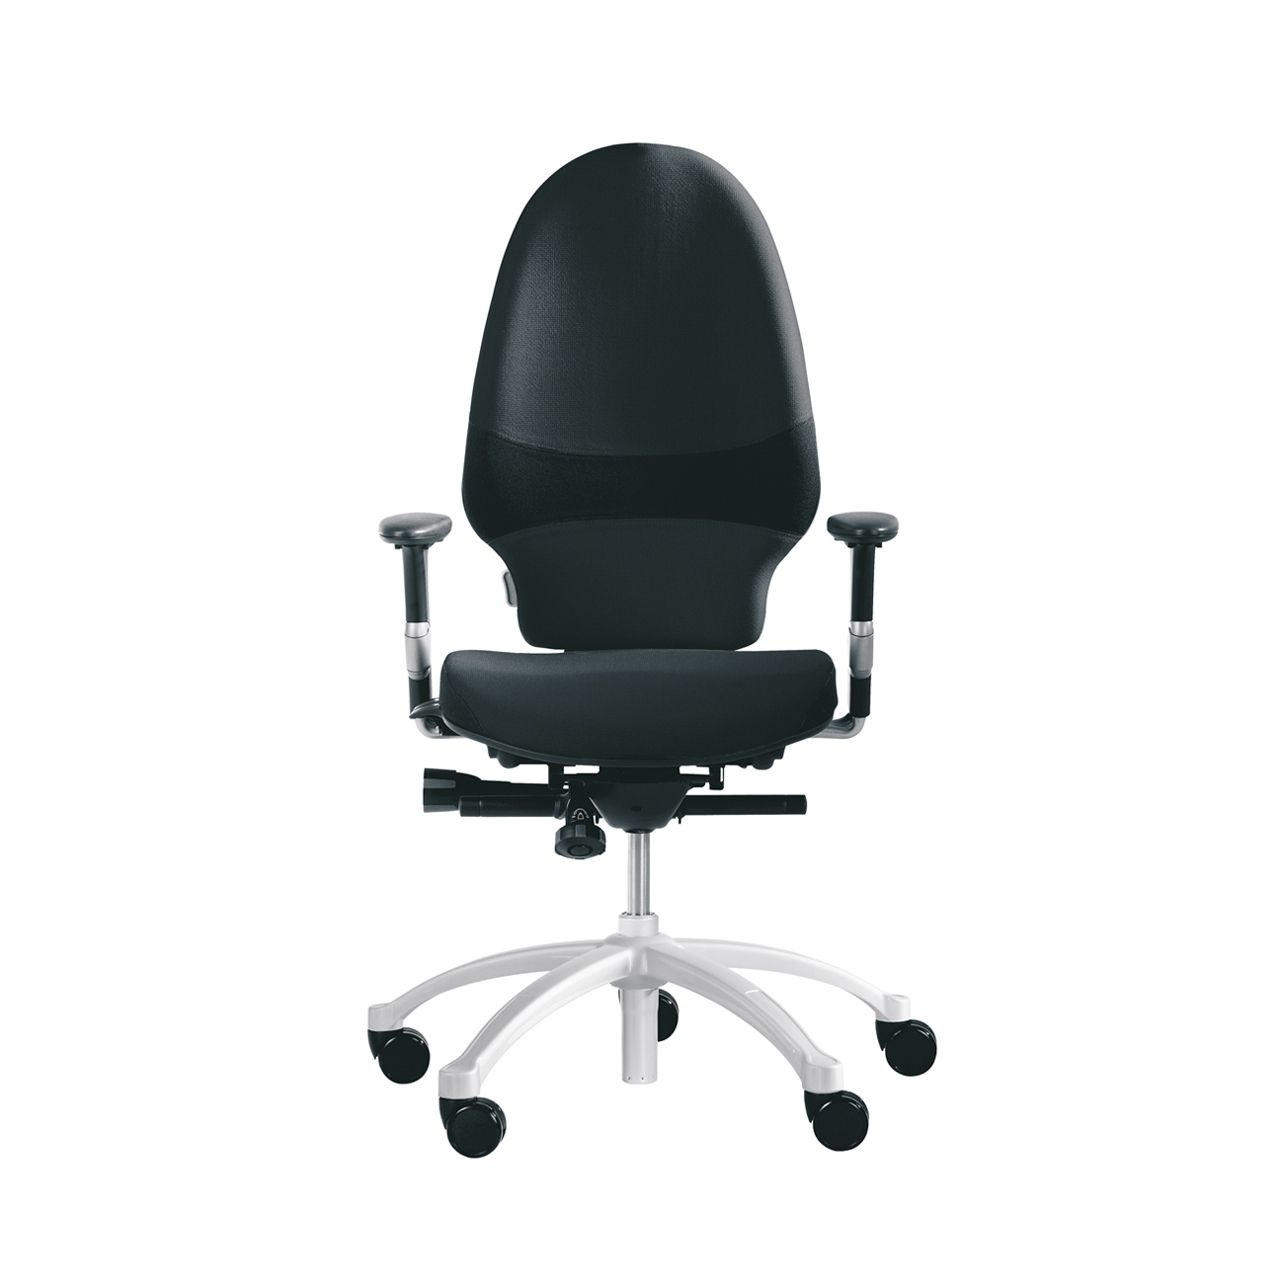 rh exrh extend large 220 bureaustoel STKAEXT203 zwart Voorkant